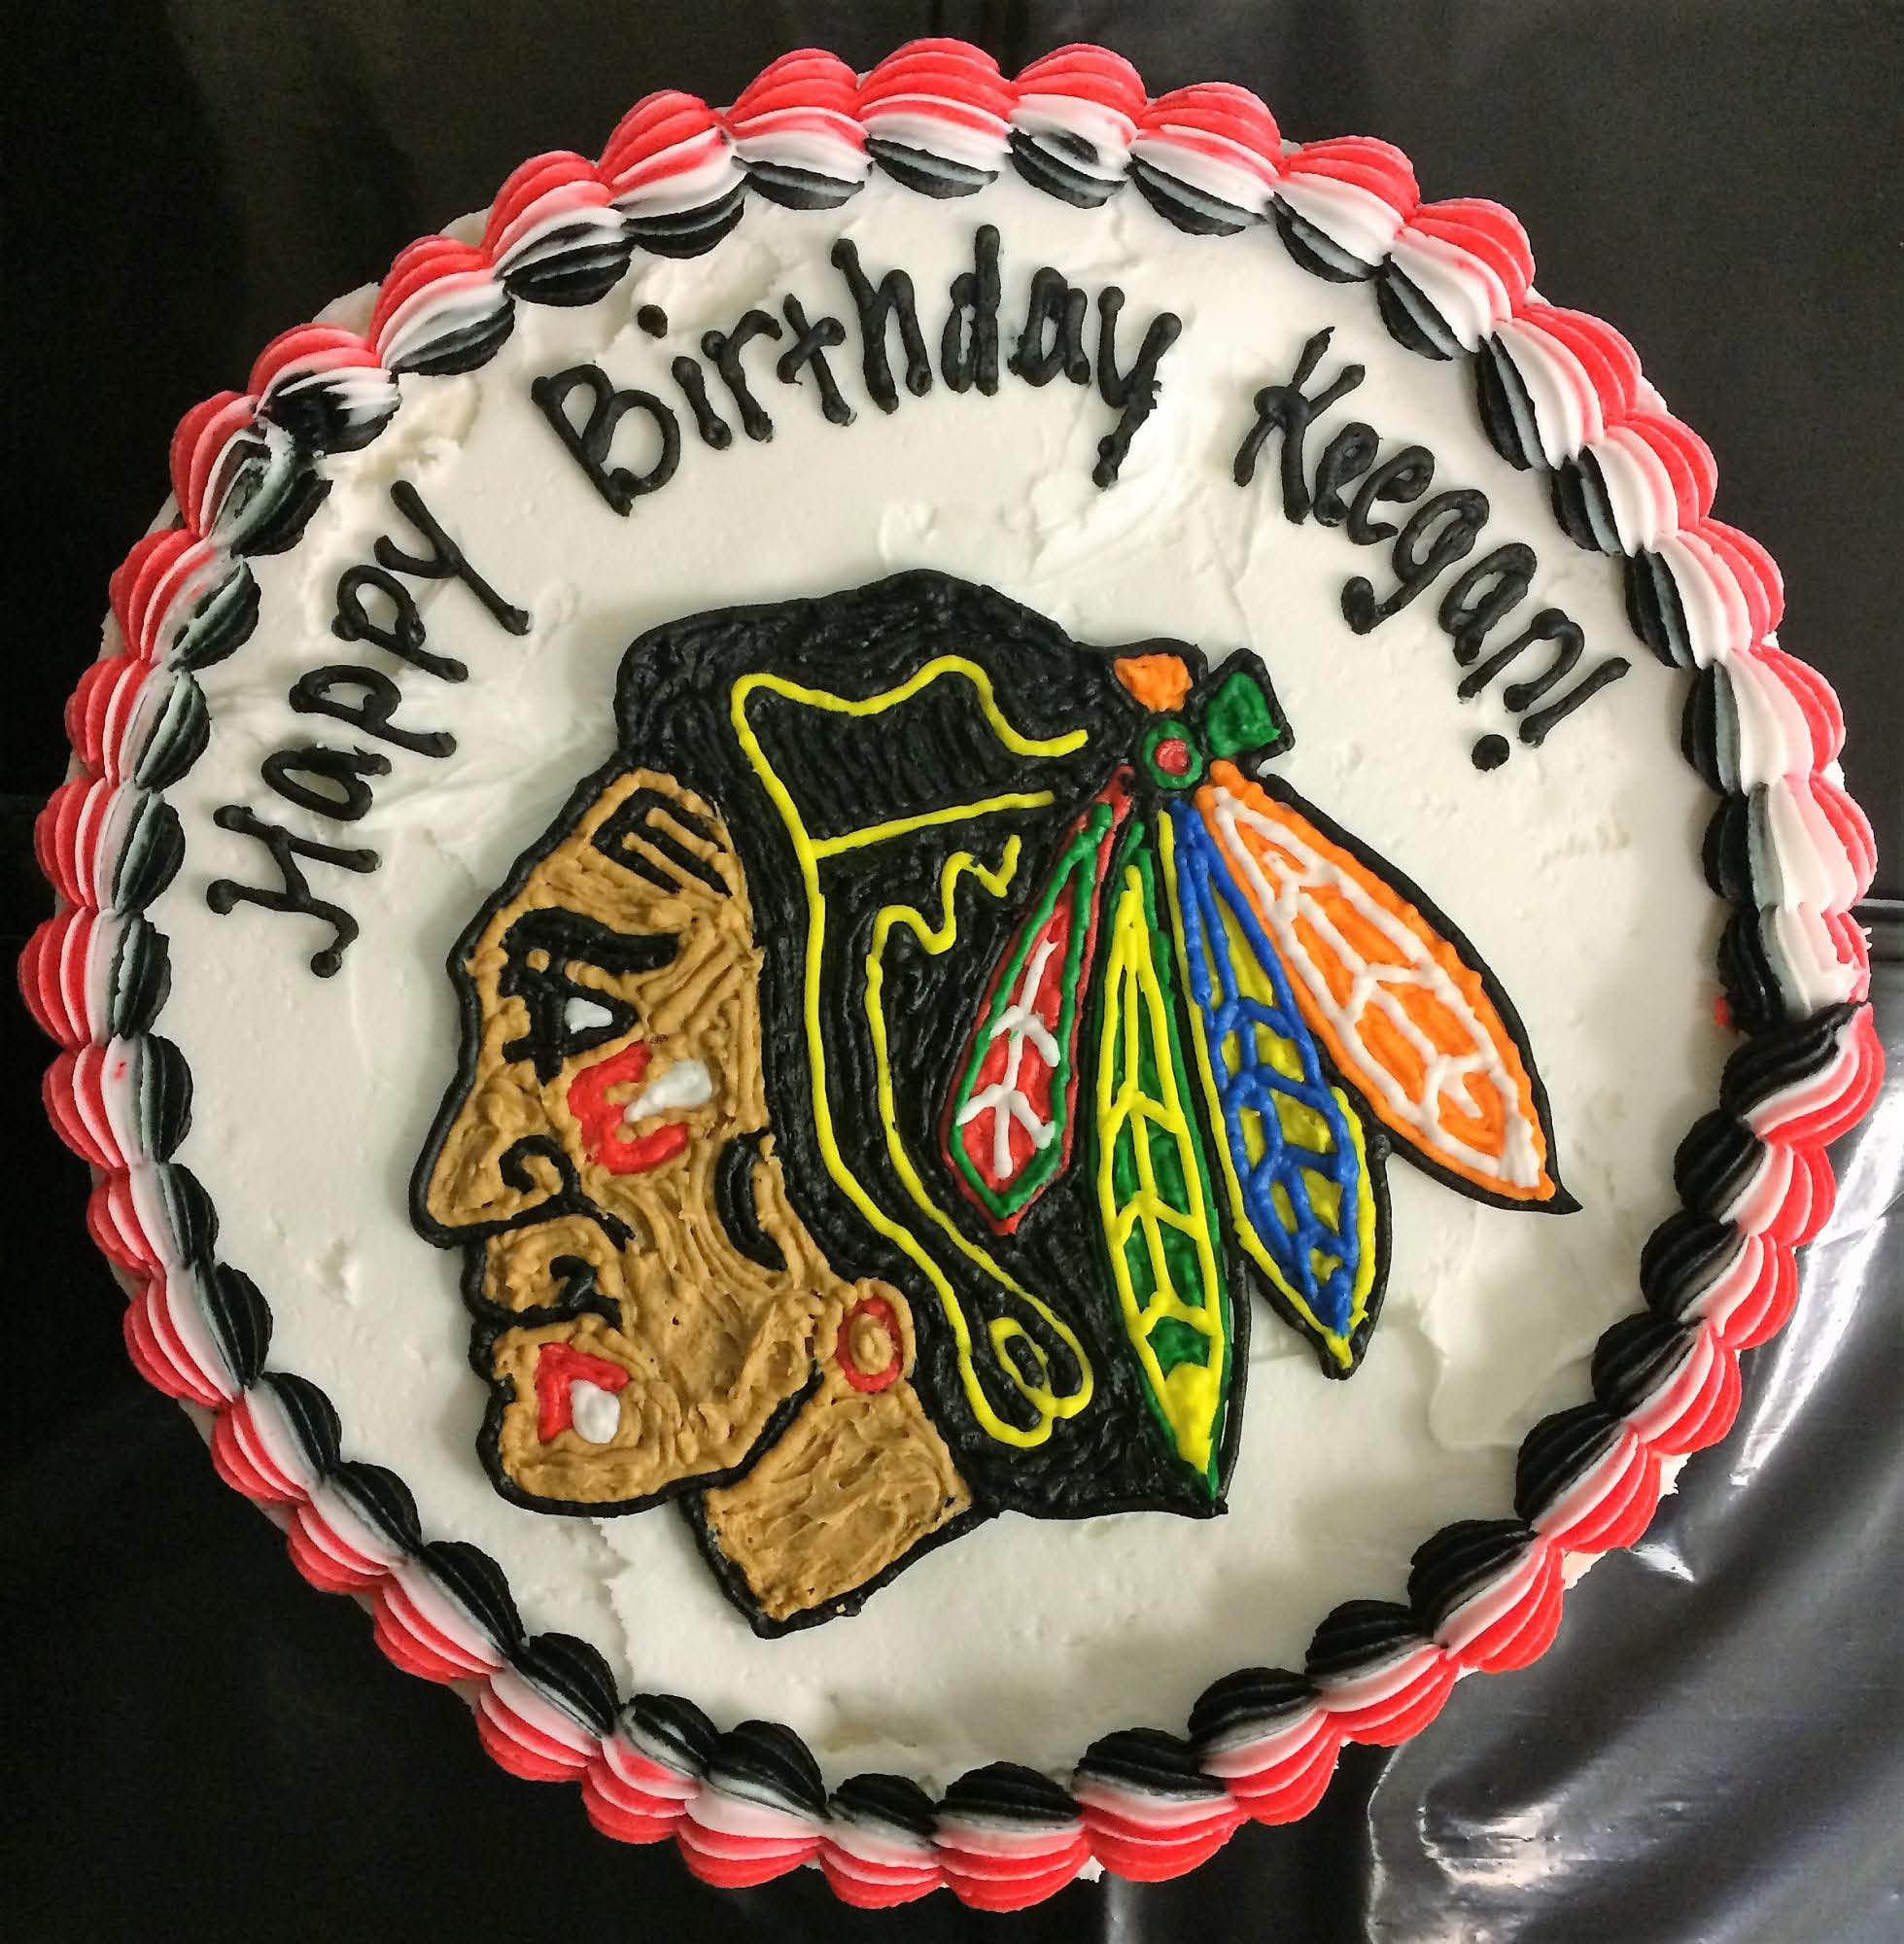 Happy Birthday cake featuring hockey team.